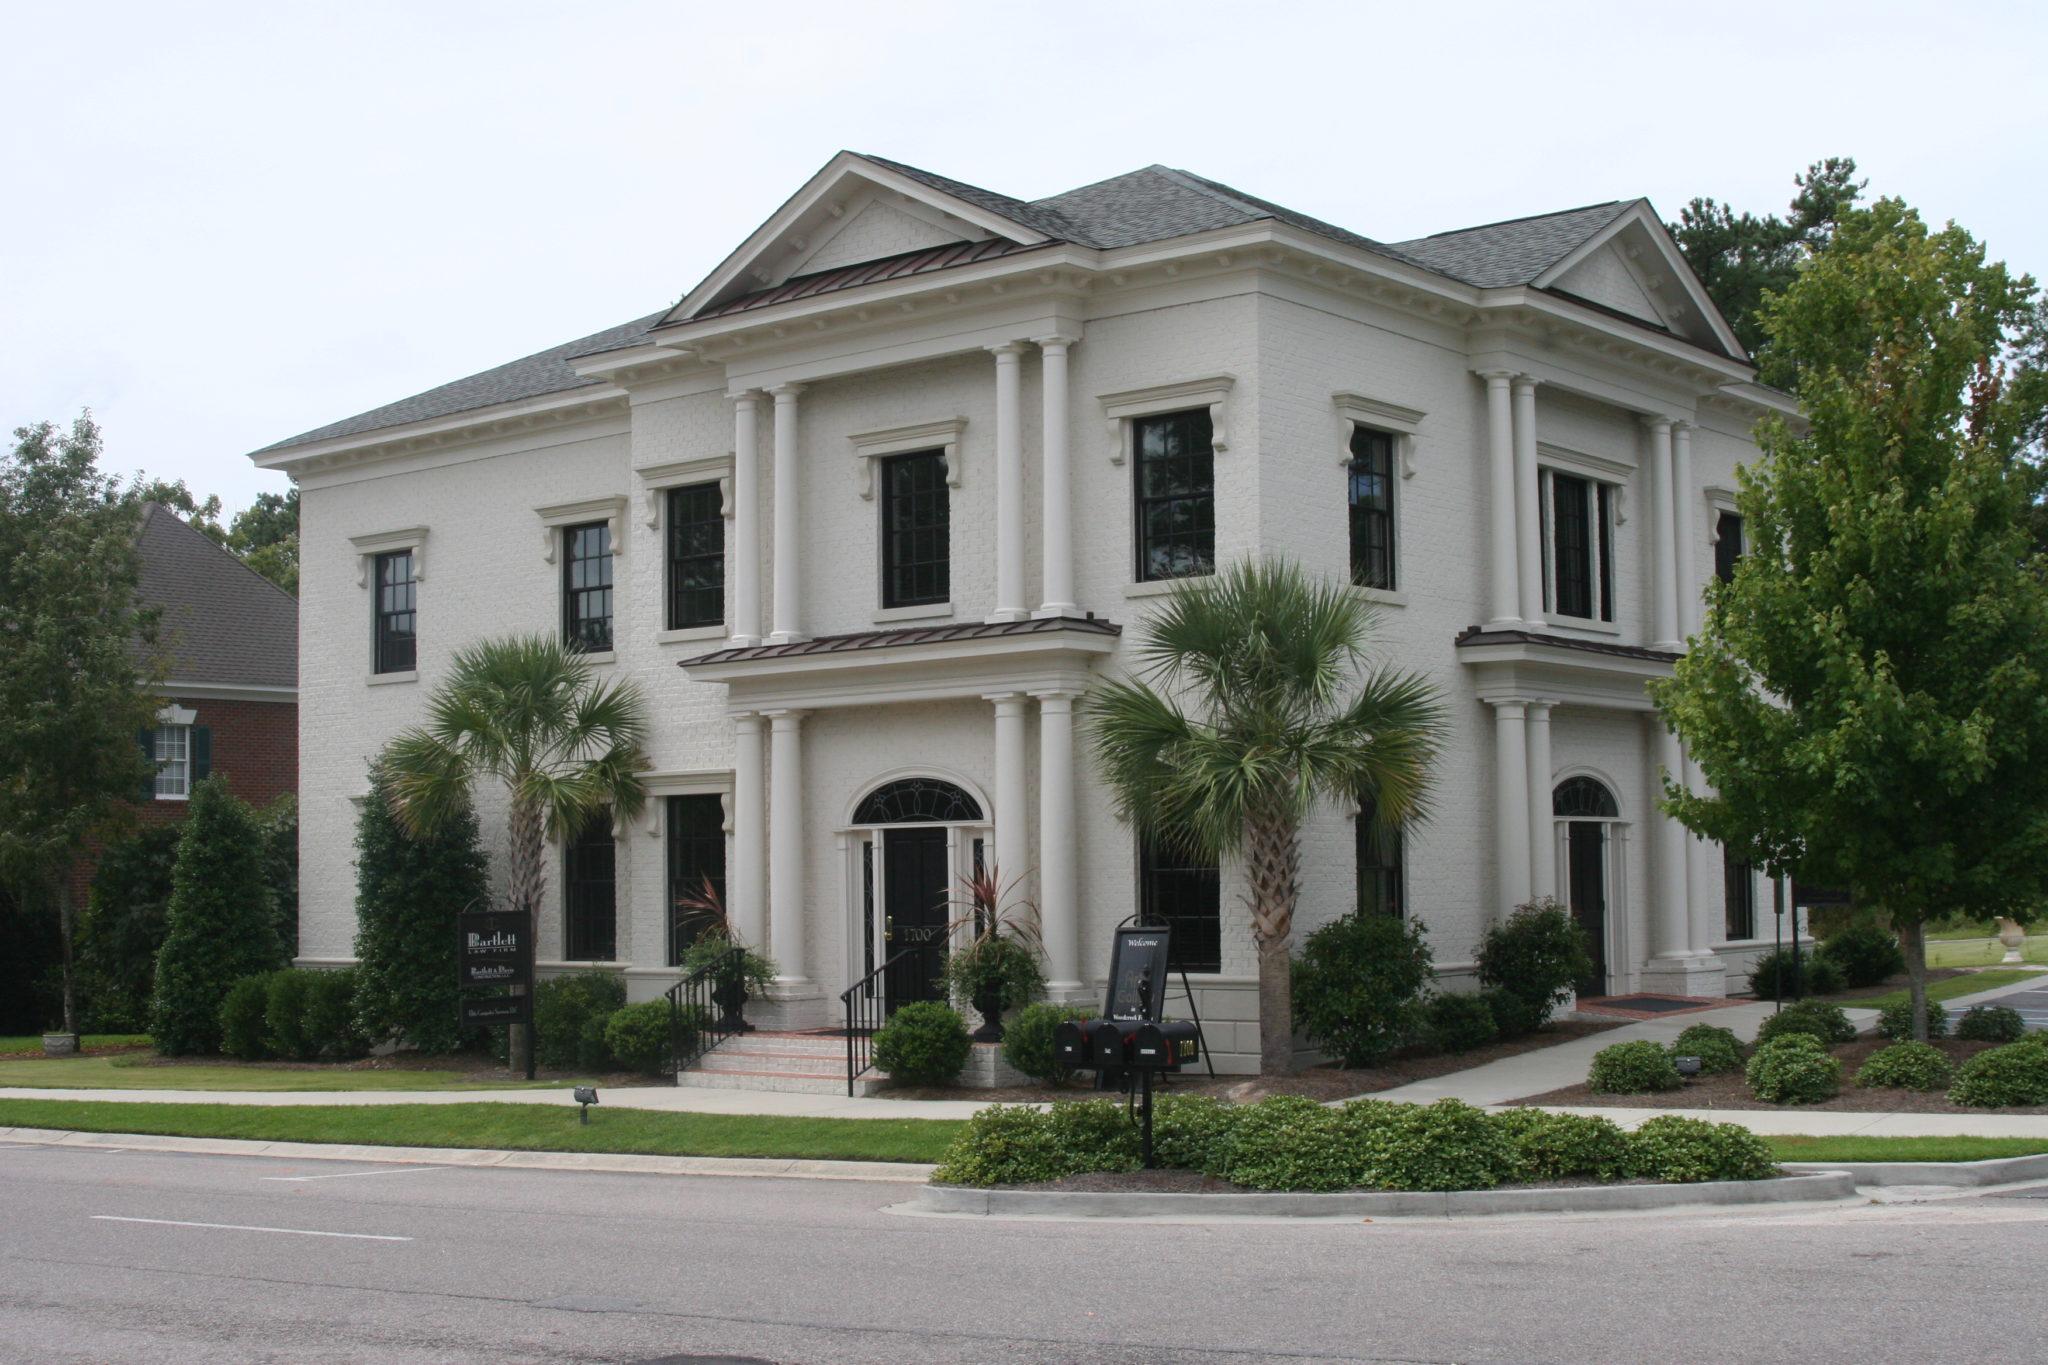 Bartlett Law Firm Columbia, South Carolina office